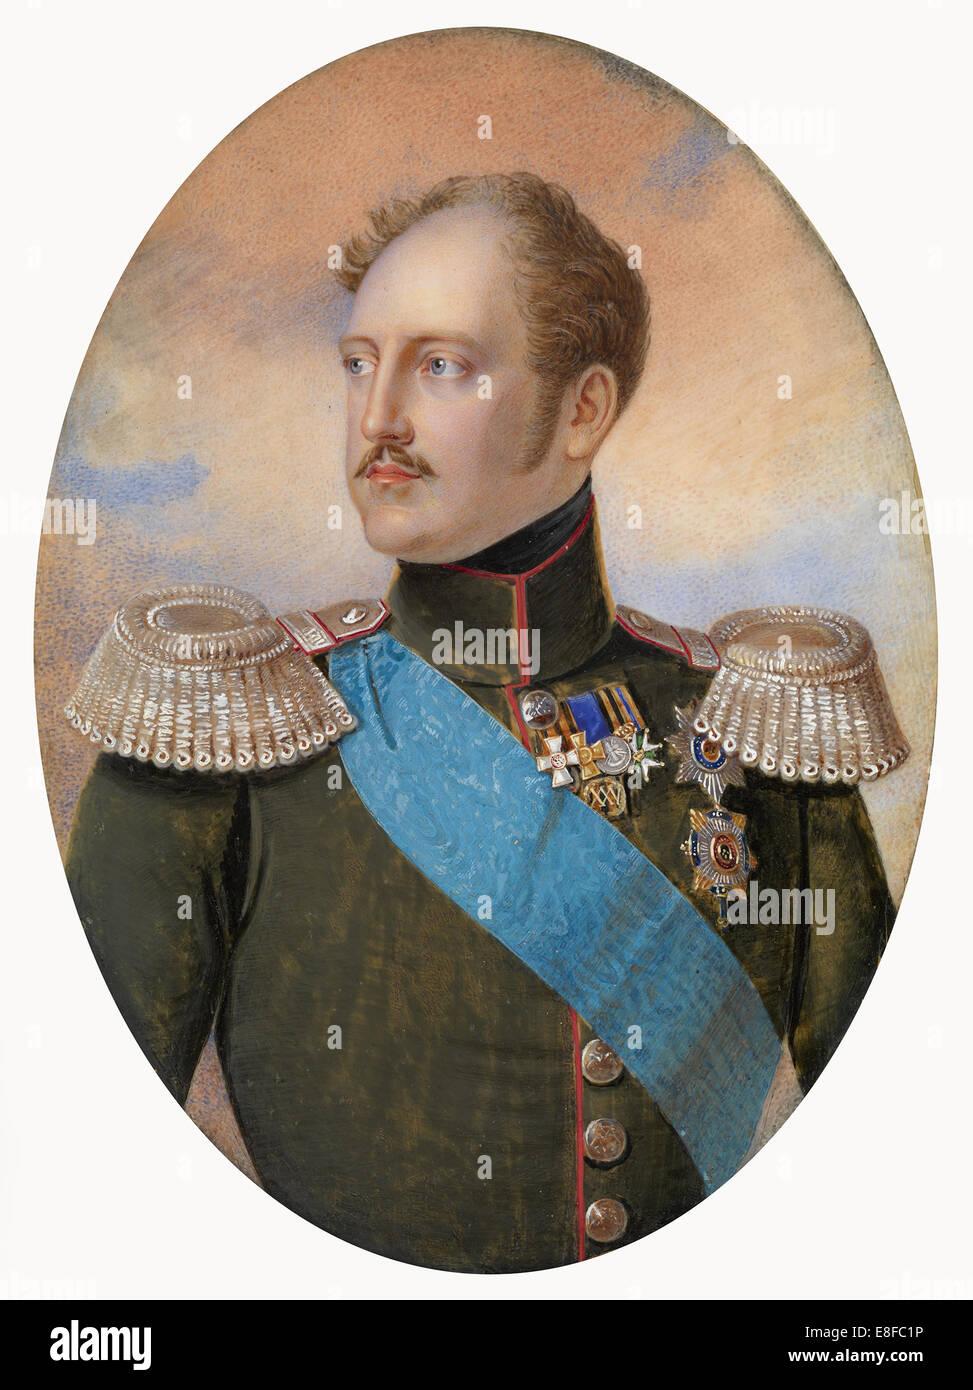 Portrait of Emperor Nicholas I  (1796-1855). Artist: Winberg, Ivan Andreyevich (?-1851) - Stock Image